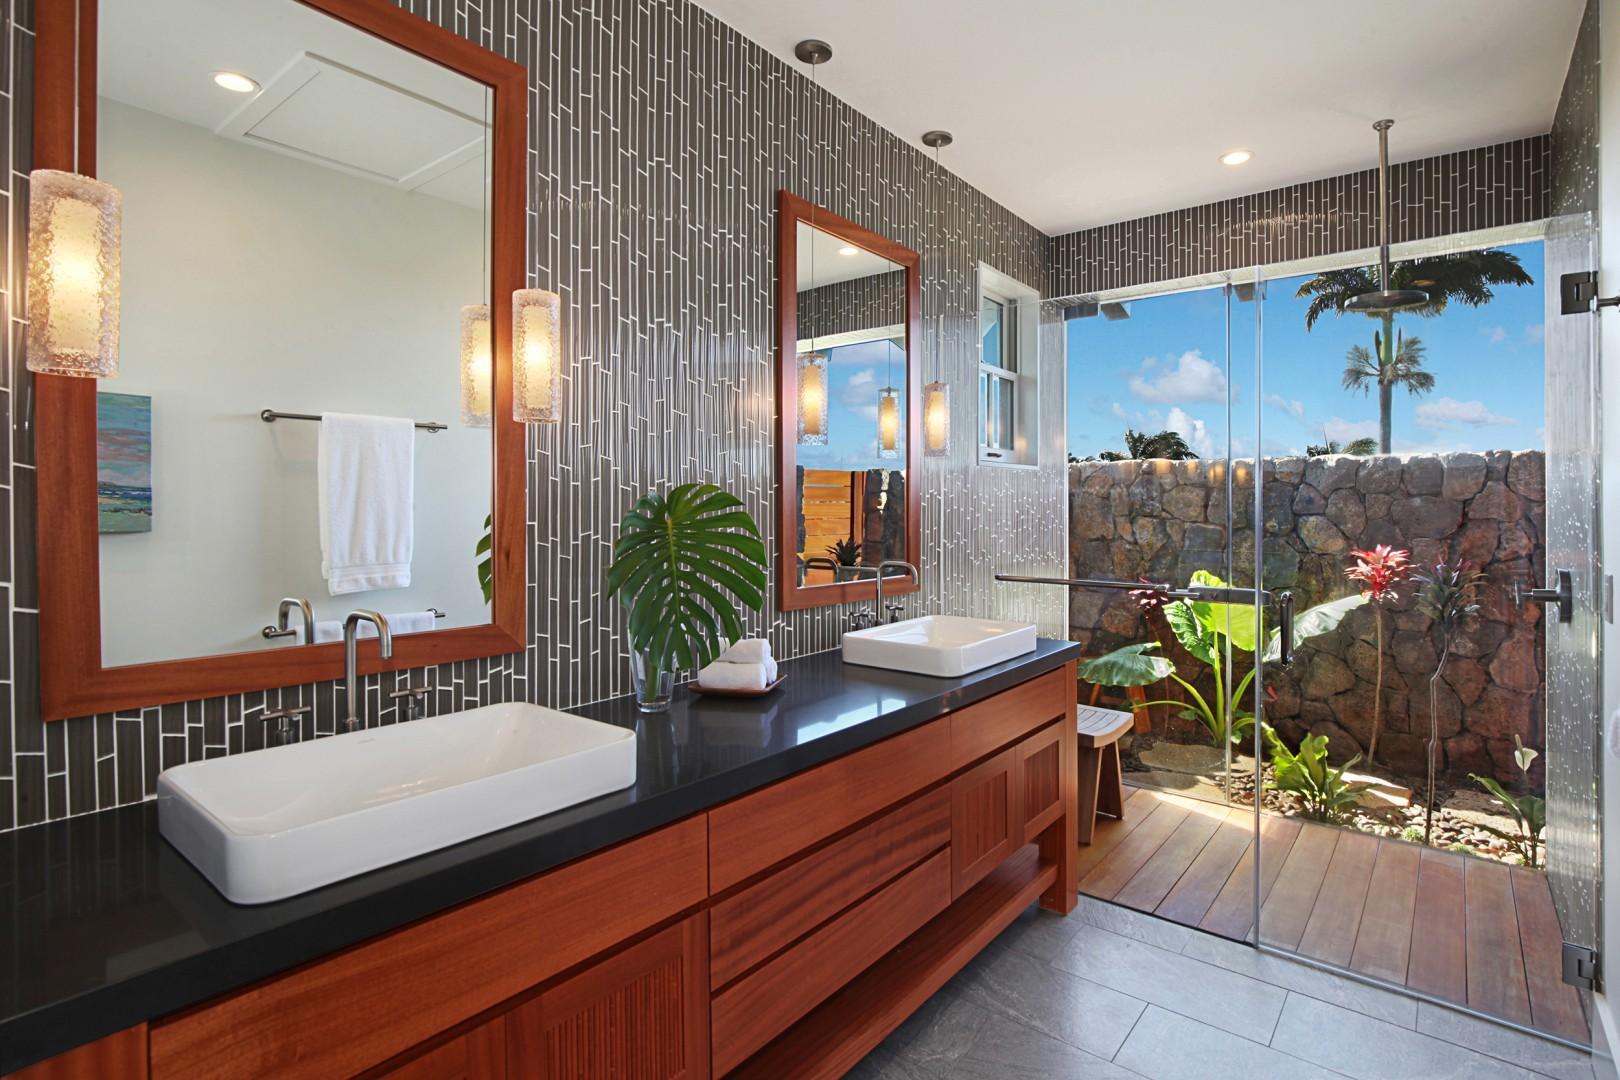 Master Suite bathroom with outdoor lava rock shower